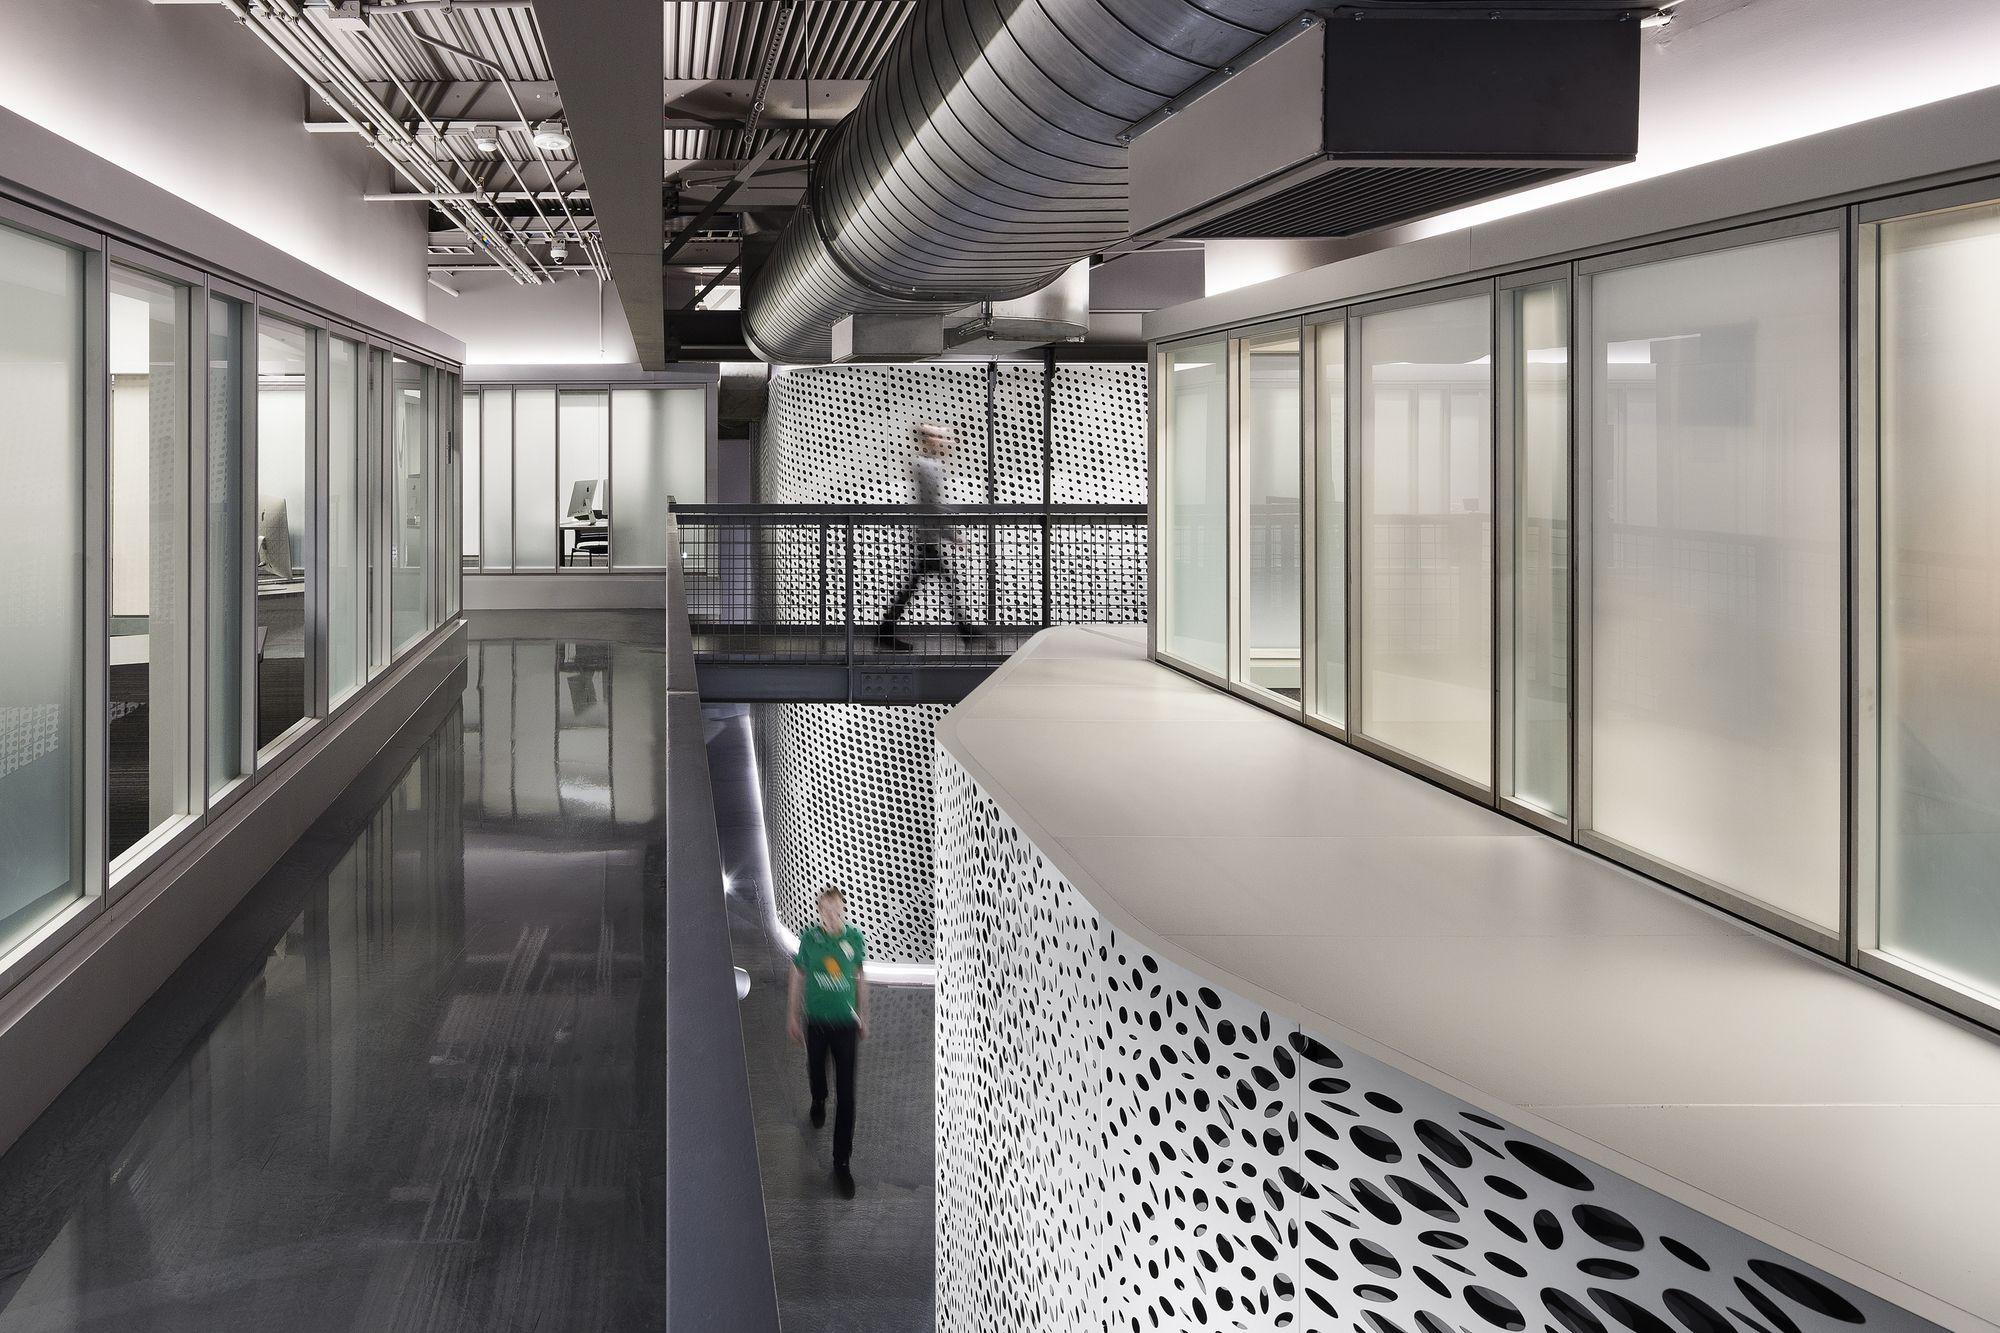 Gallery Of Pratt Instituteu0027s New Film/Video Department Building / Think!   6